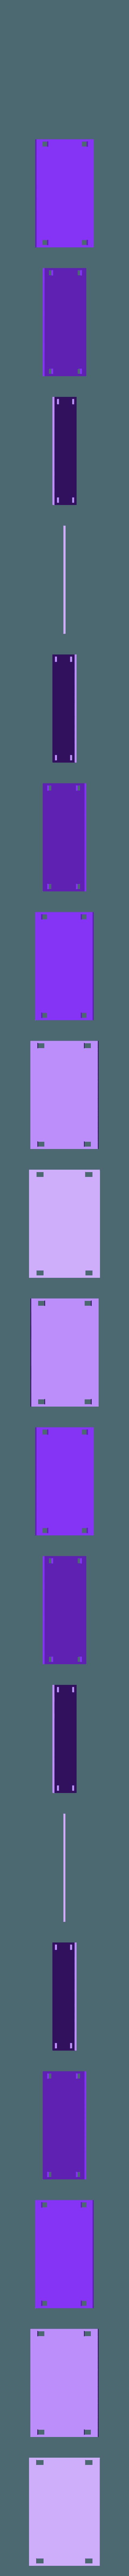 "Slide_Bottom_Inner.stl Download free STL file ""Pencil"" Puzzler • 3D printing design, gzumwalt"